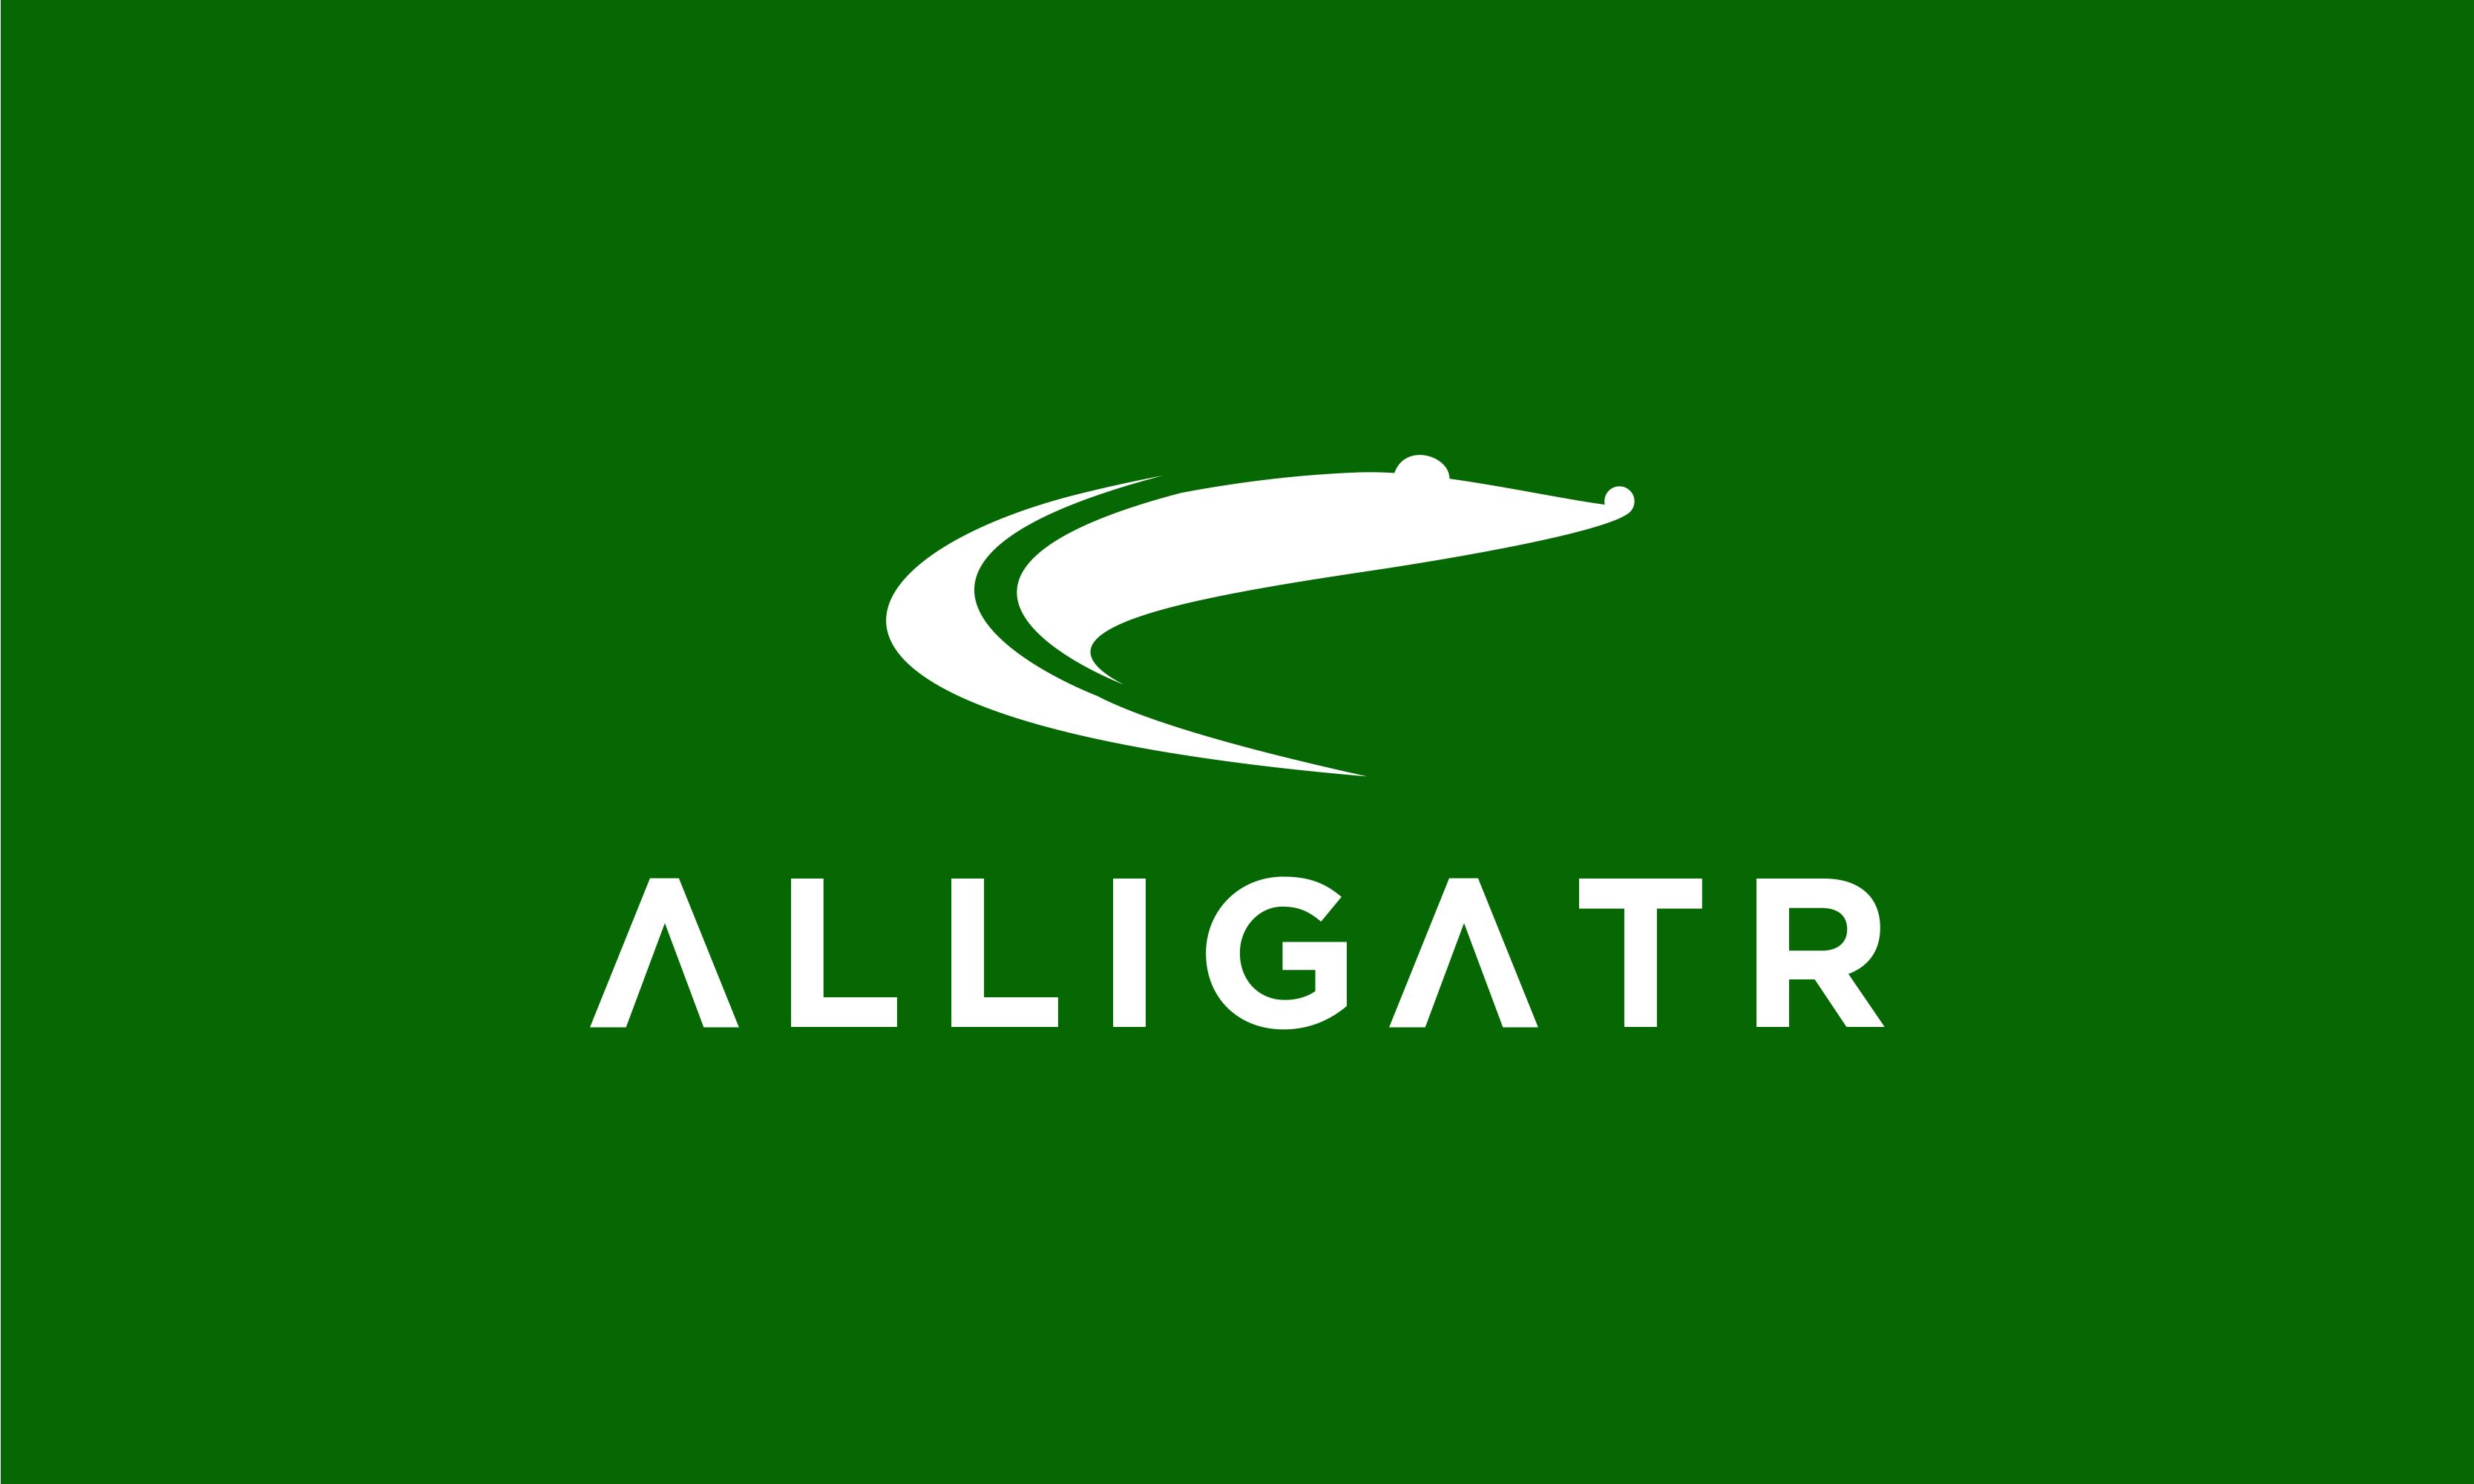 Alligatr